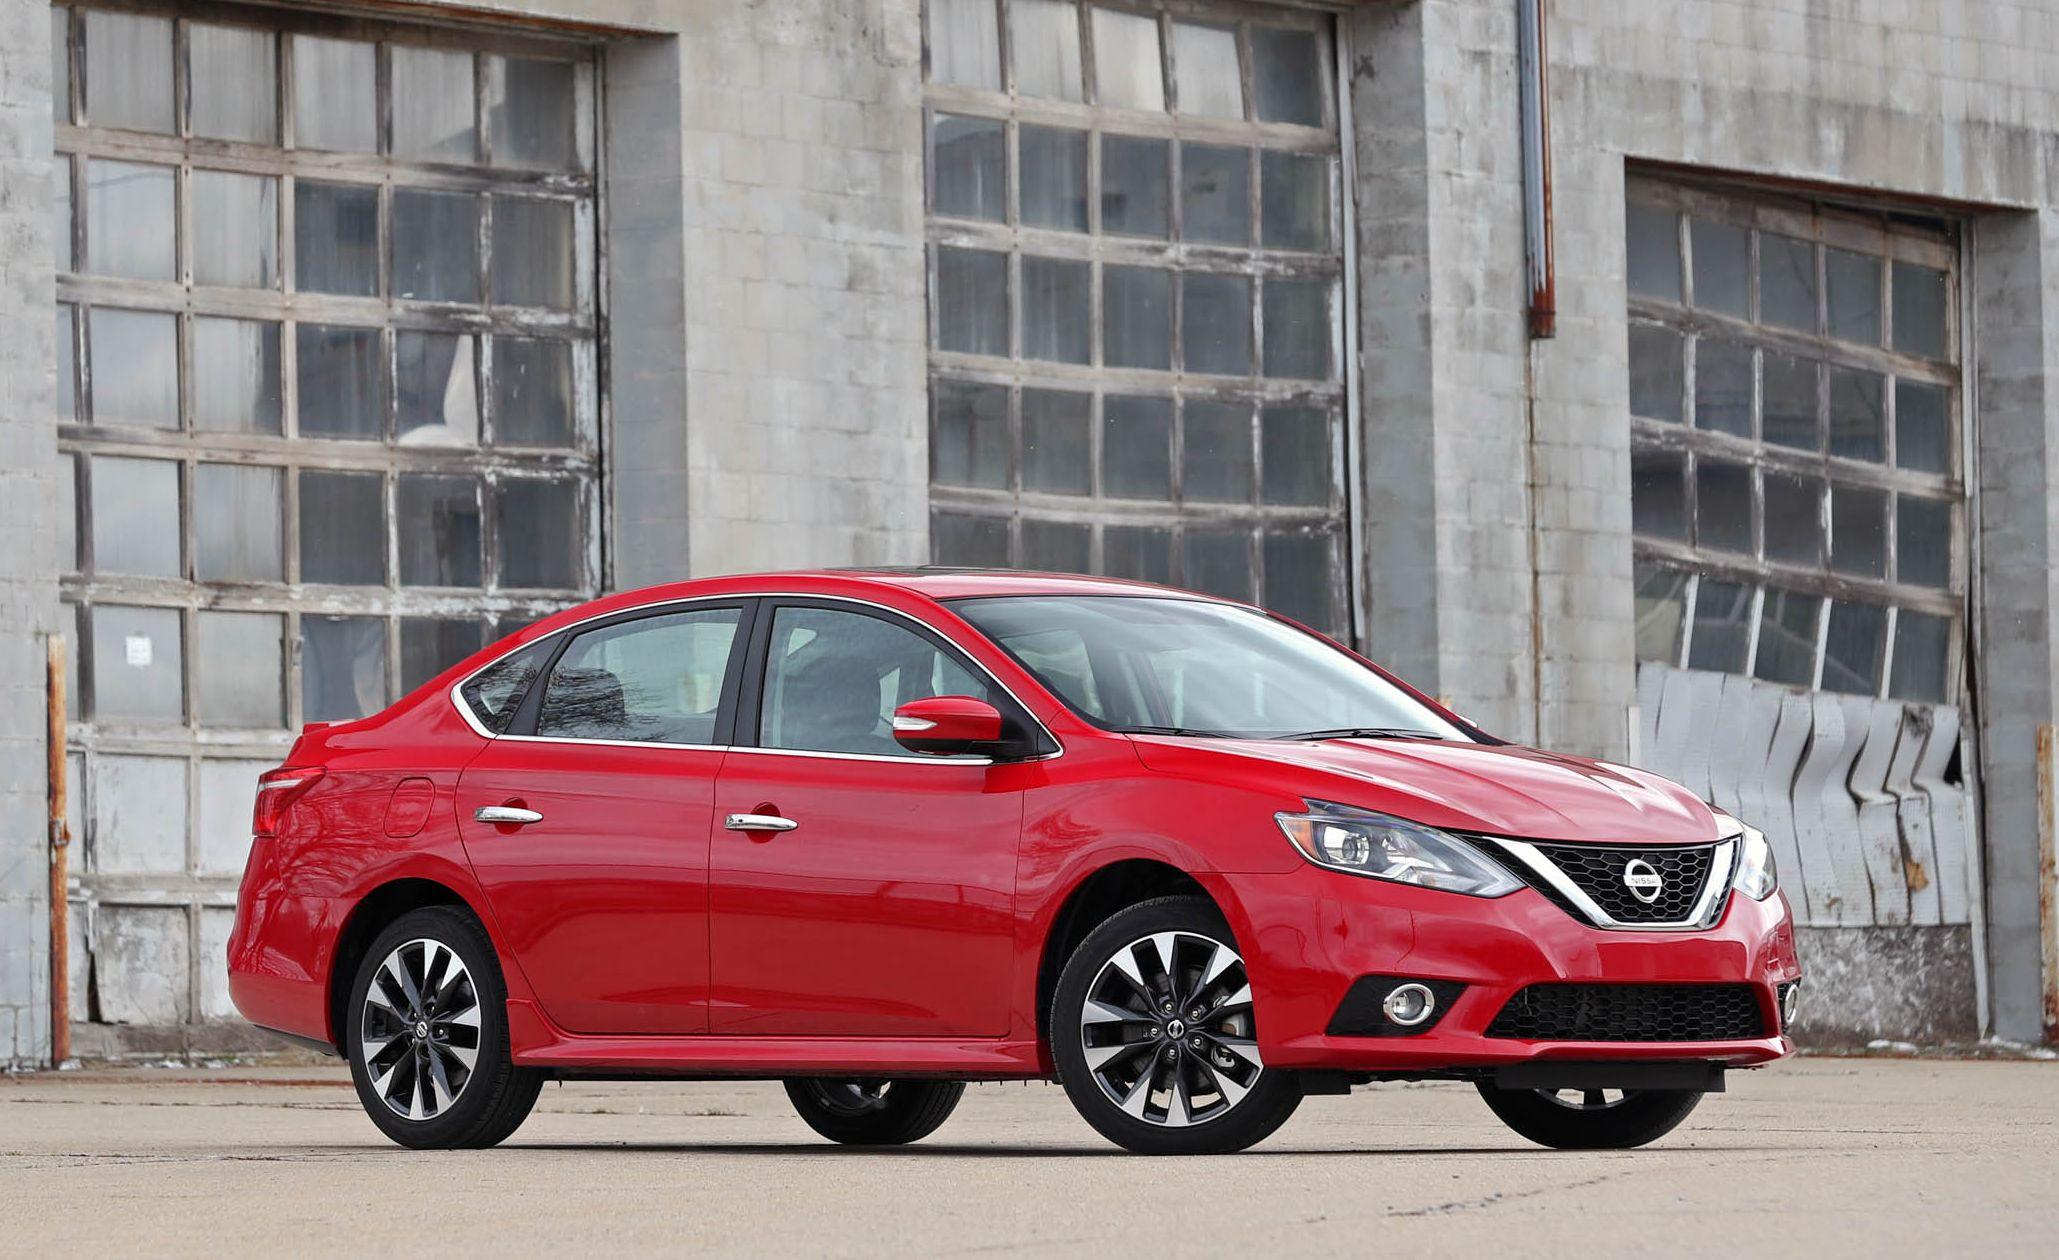 2018 Nissan Sentra front